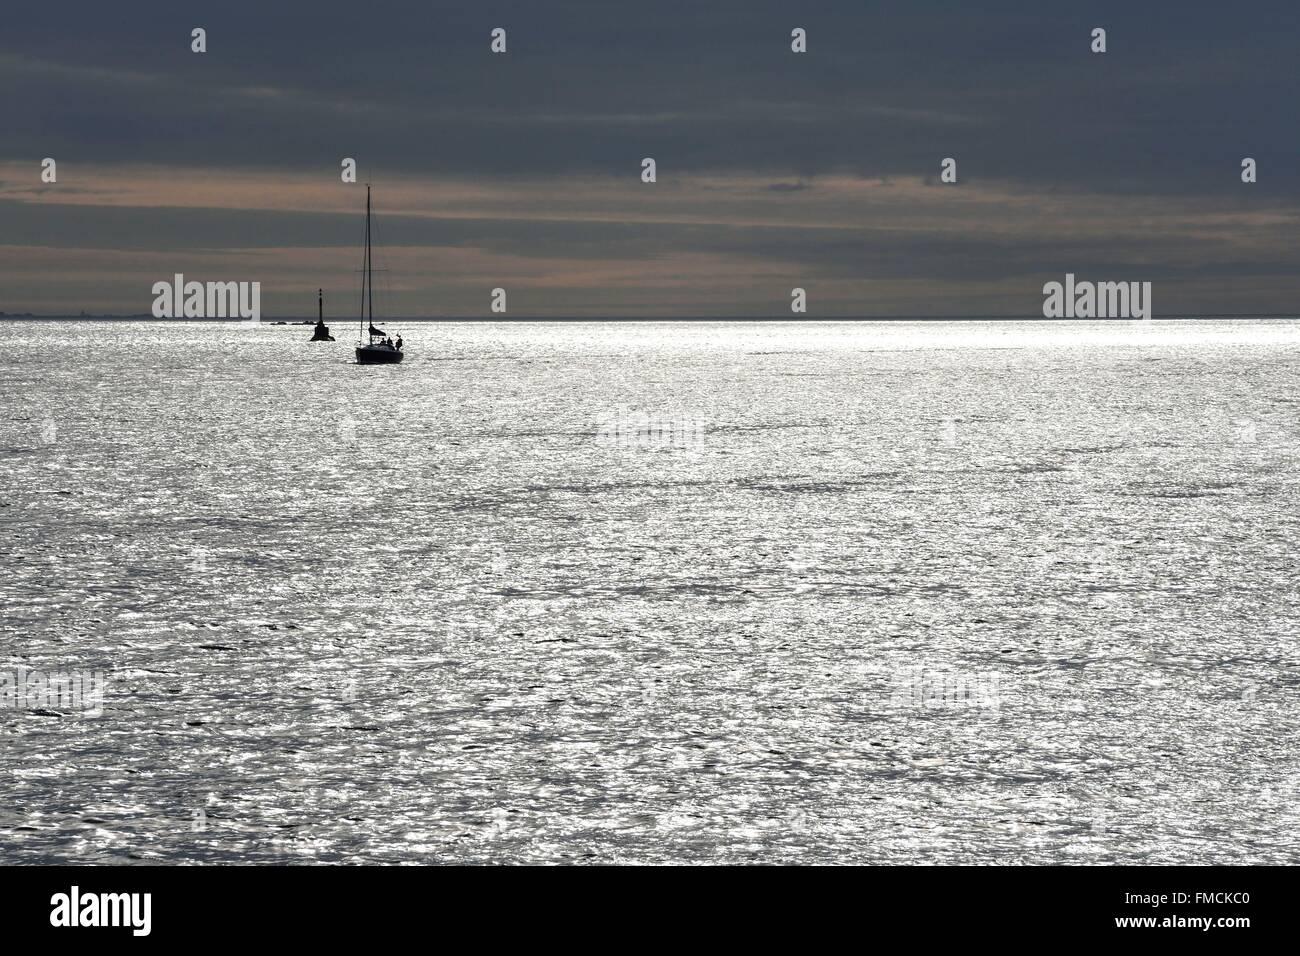 France, Finistere, sailboat off the Ile de Batz - Stock Image